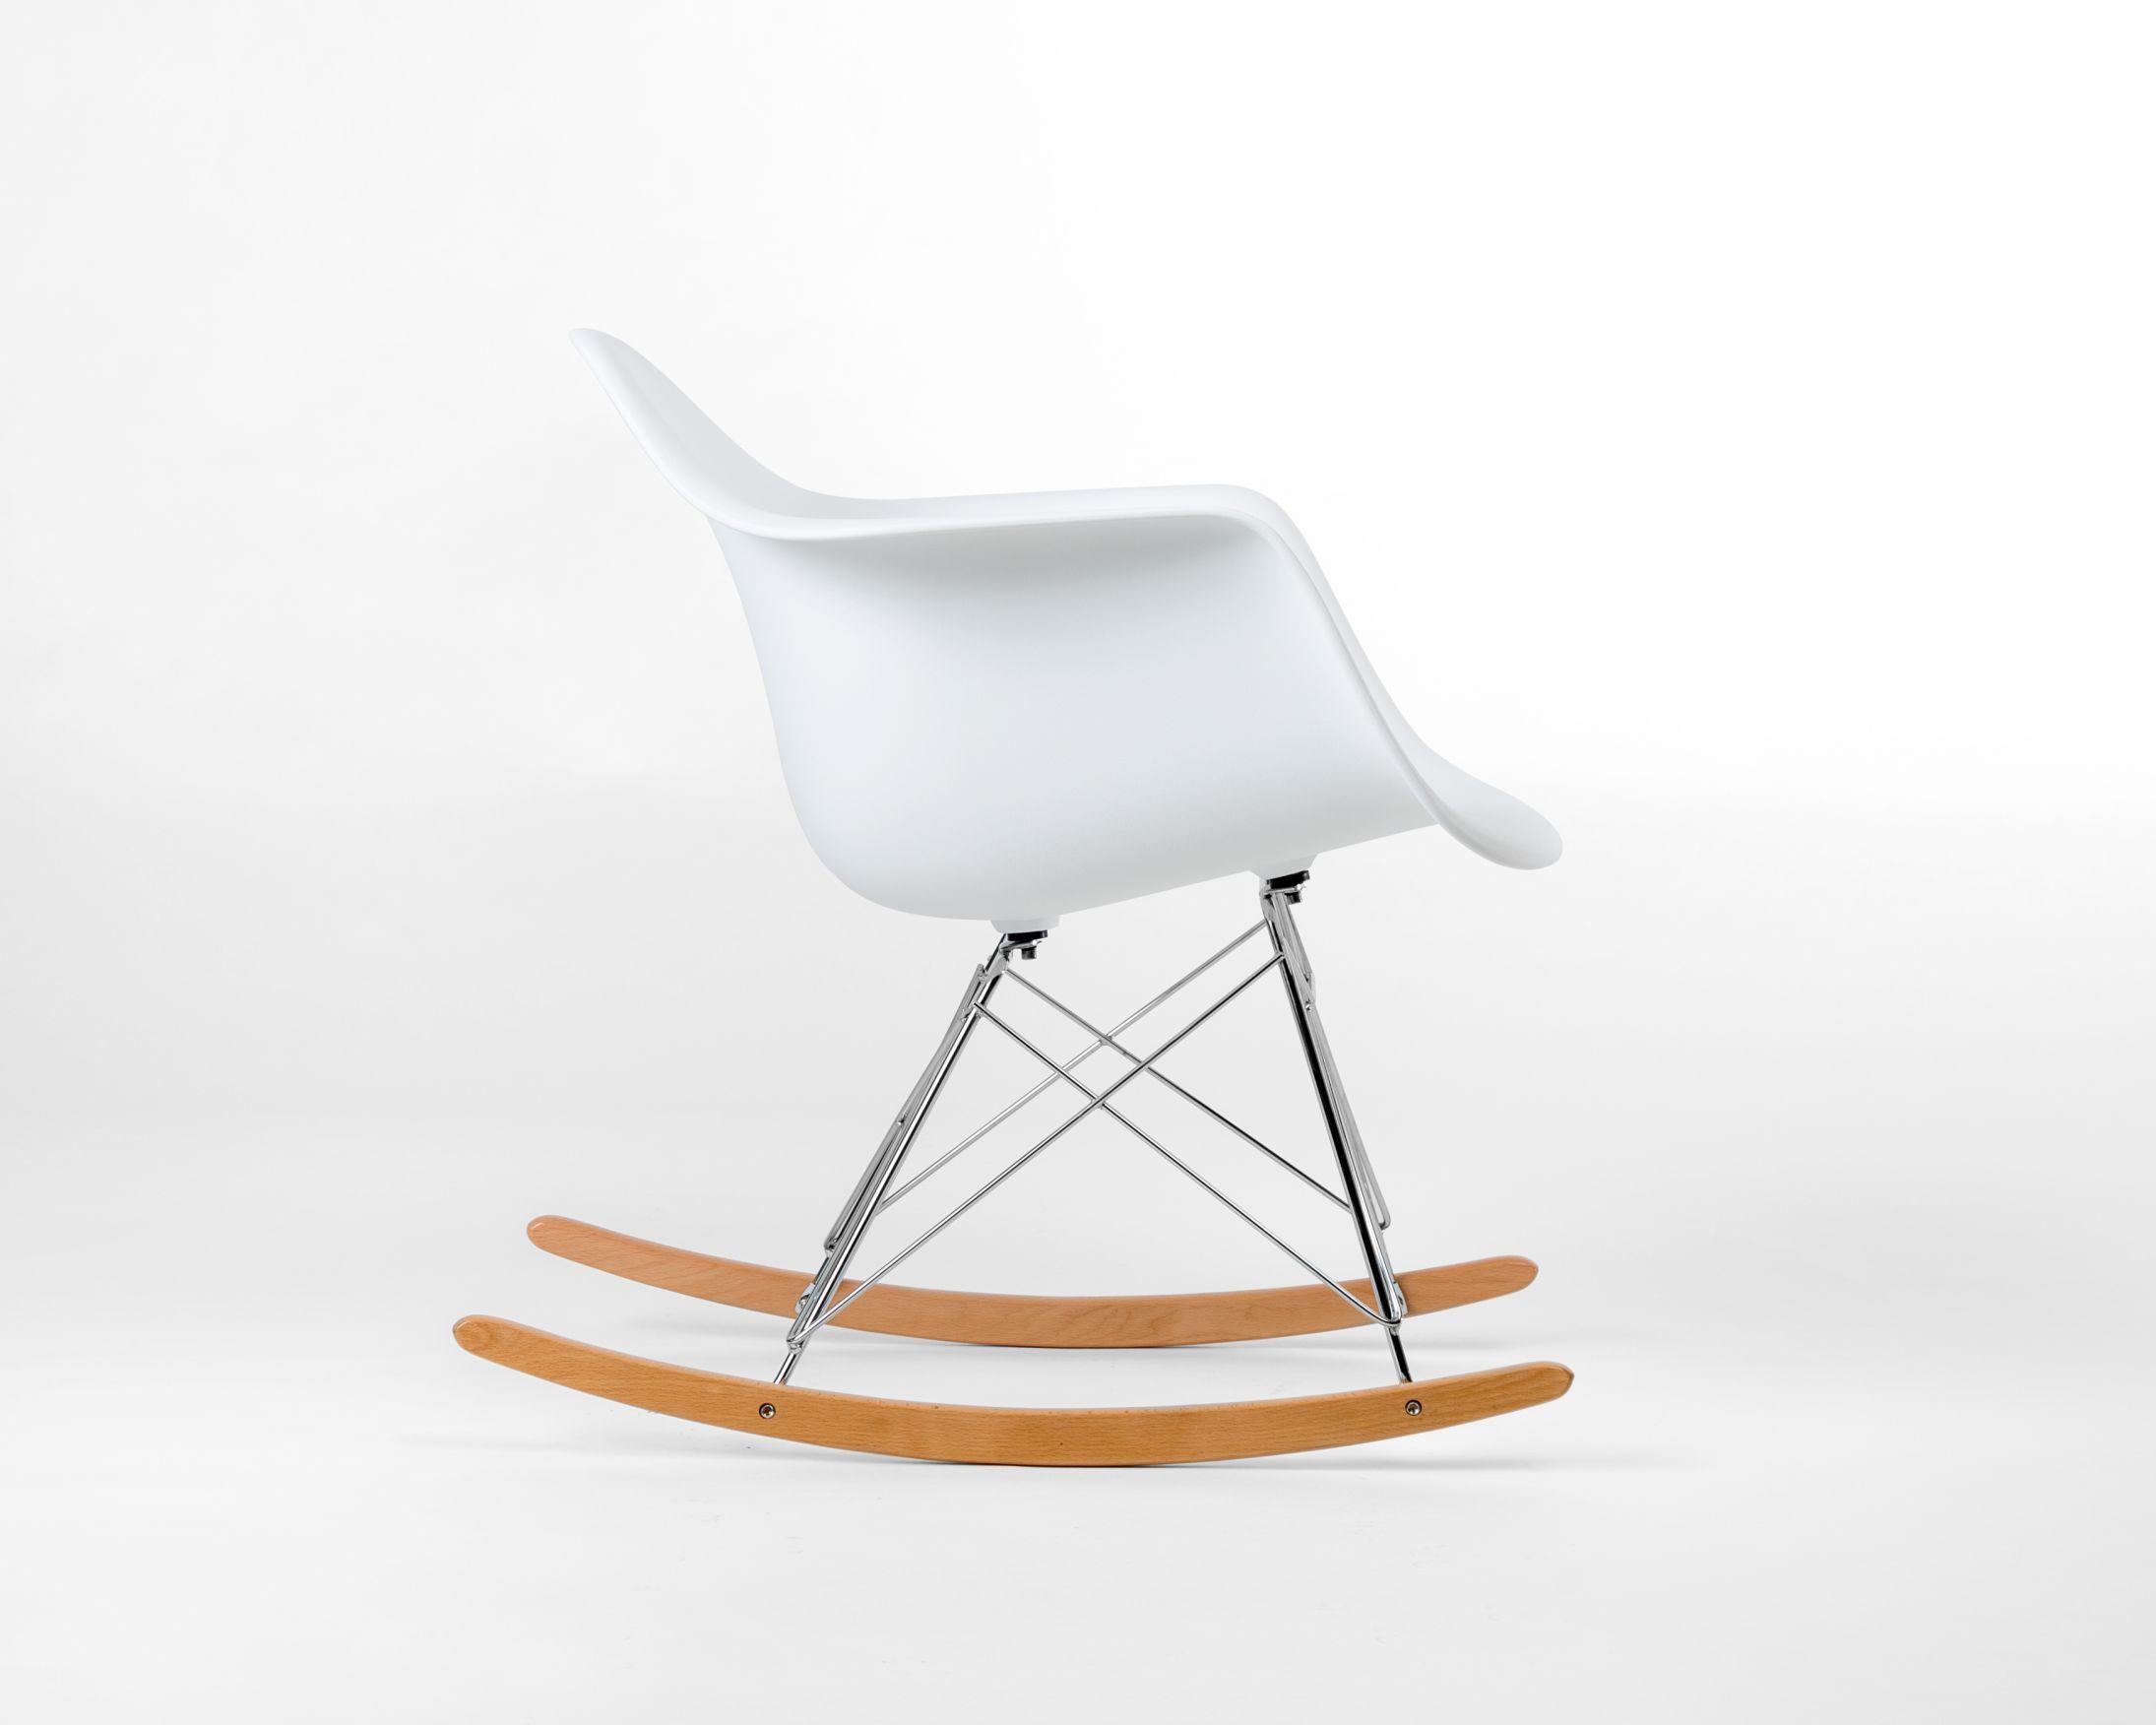 Rar Molded Plastic Rocker Cheap Office Chairs Leather Chaise Lounge Chair Eames Rocker